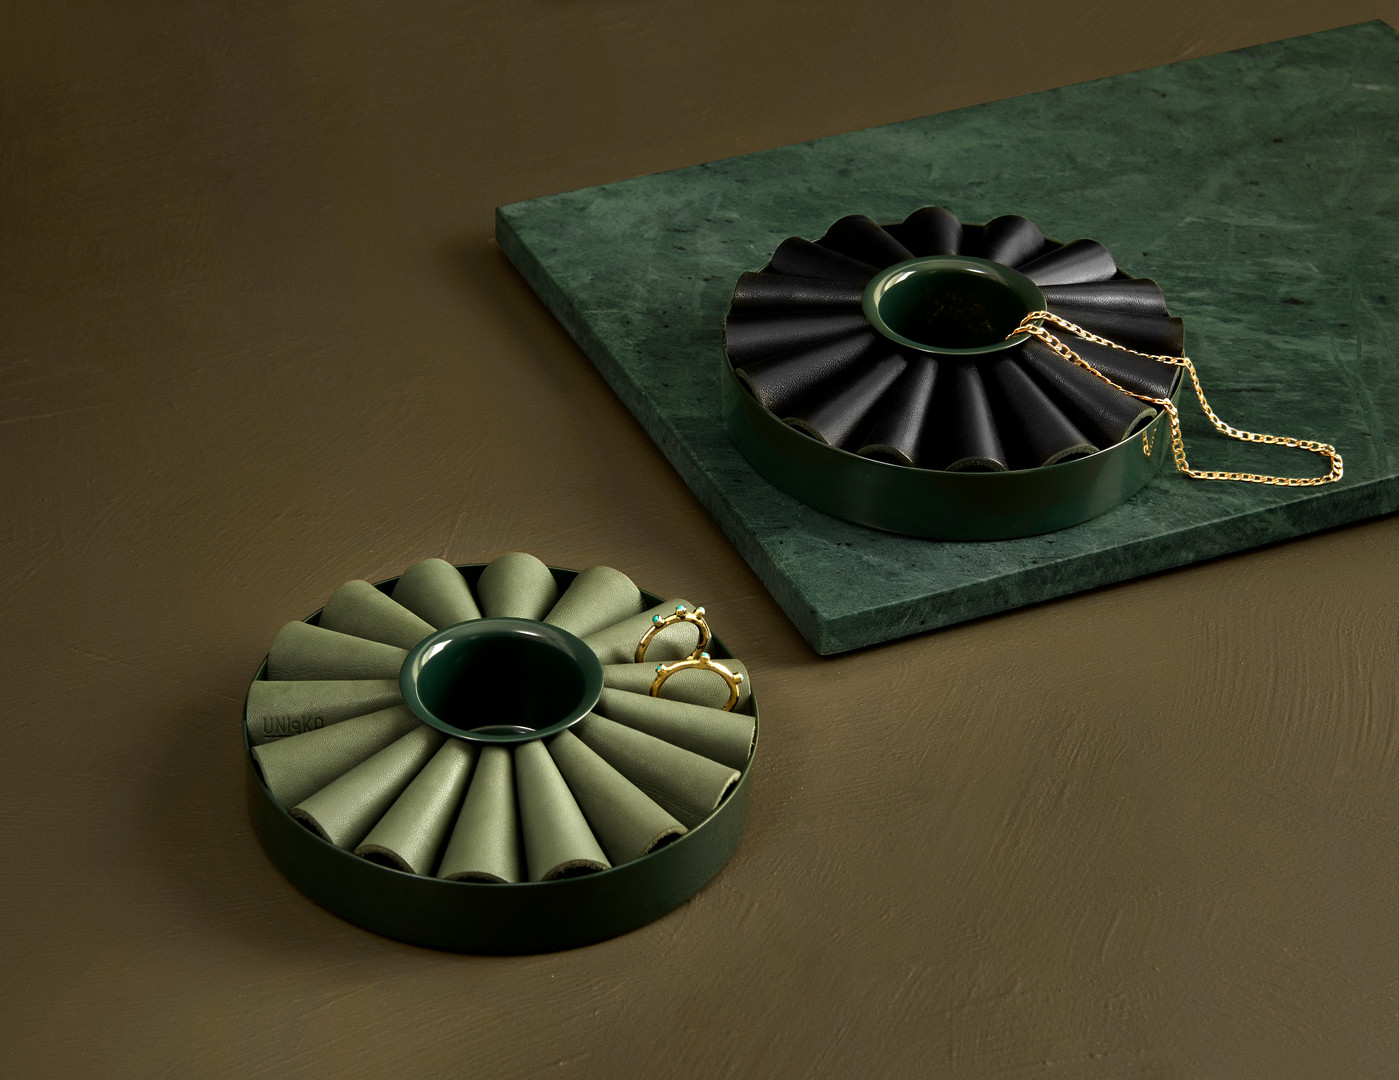 Uniqka_Bellis Green & Bellis Black.jpg